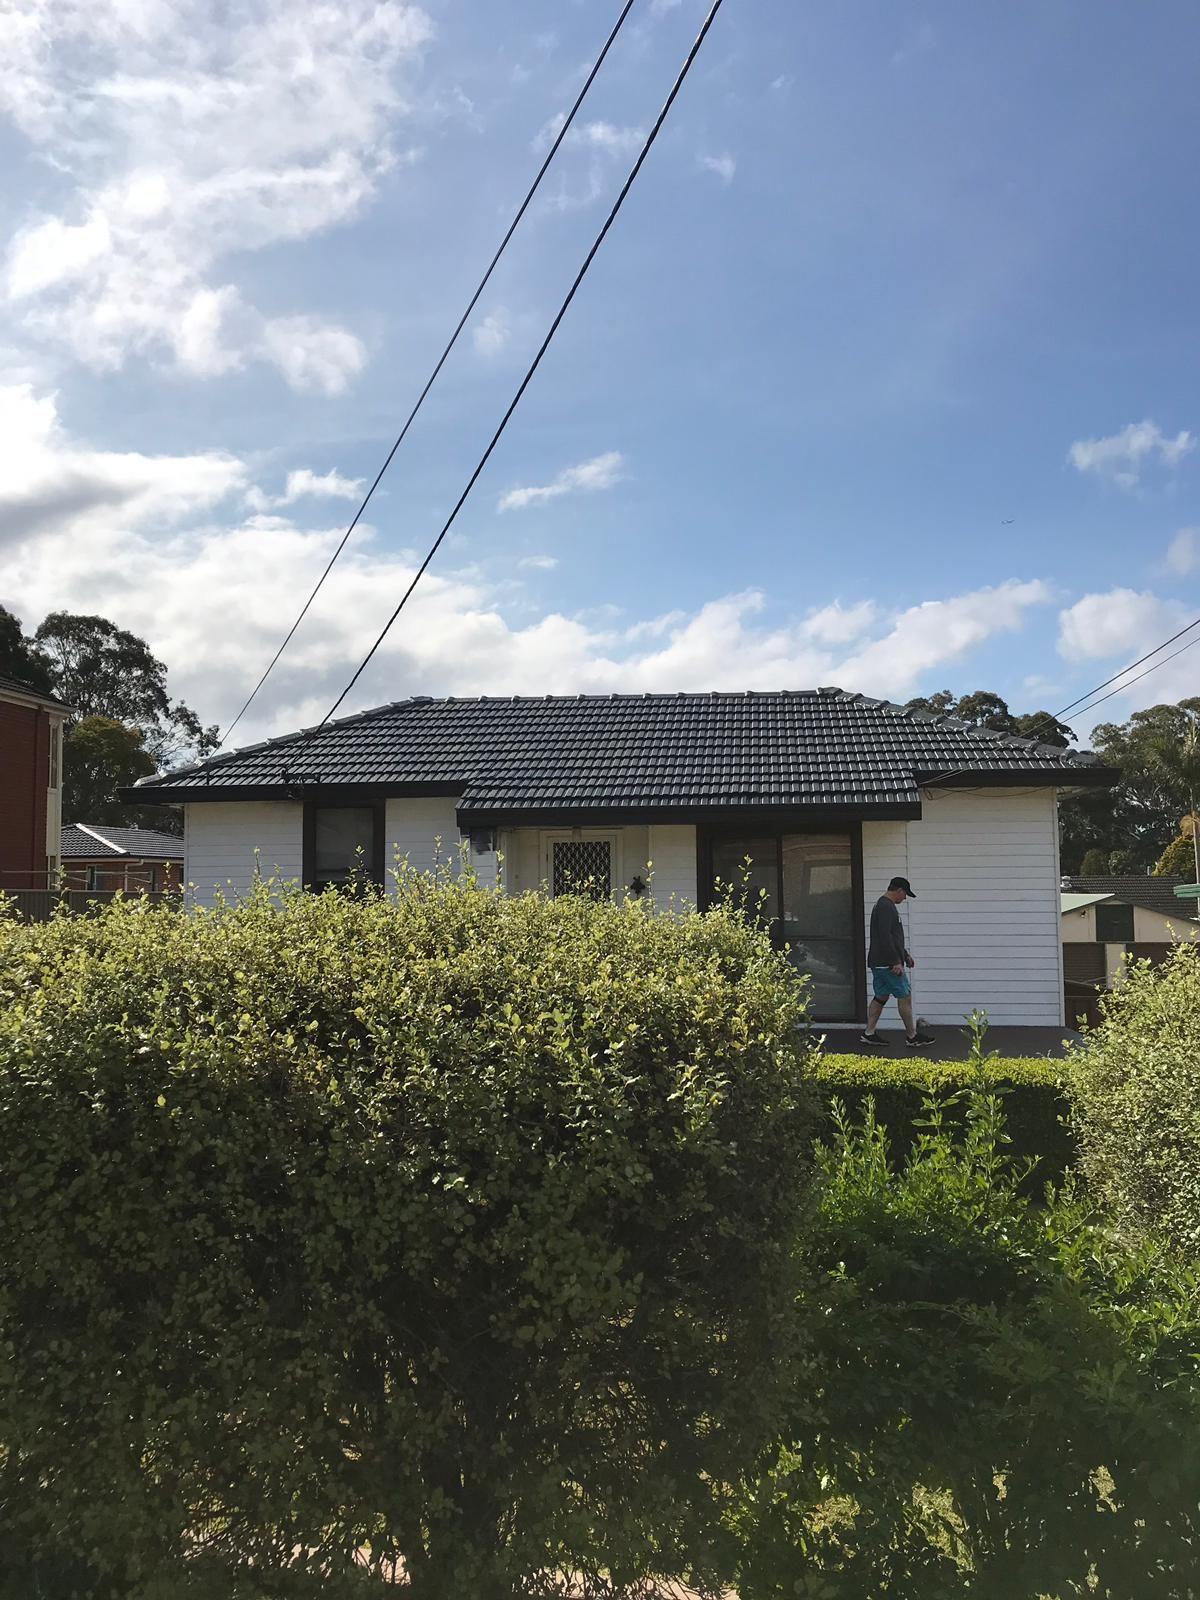 Best Roof Repair Service In Sydney In 2020 Roof Restoration Roof Paint Roof Repair